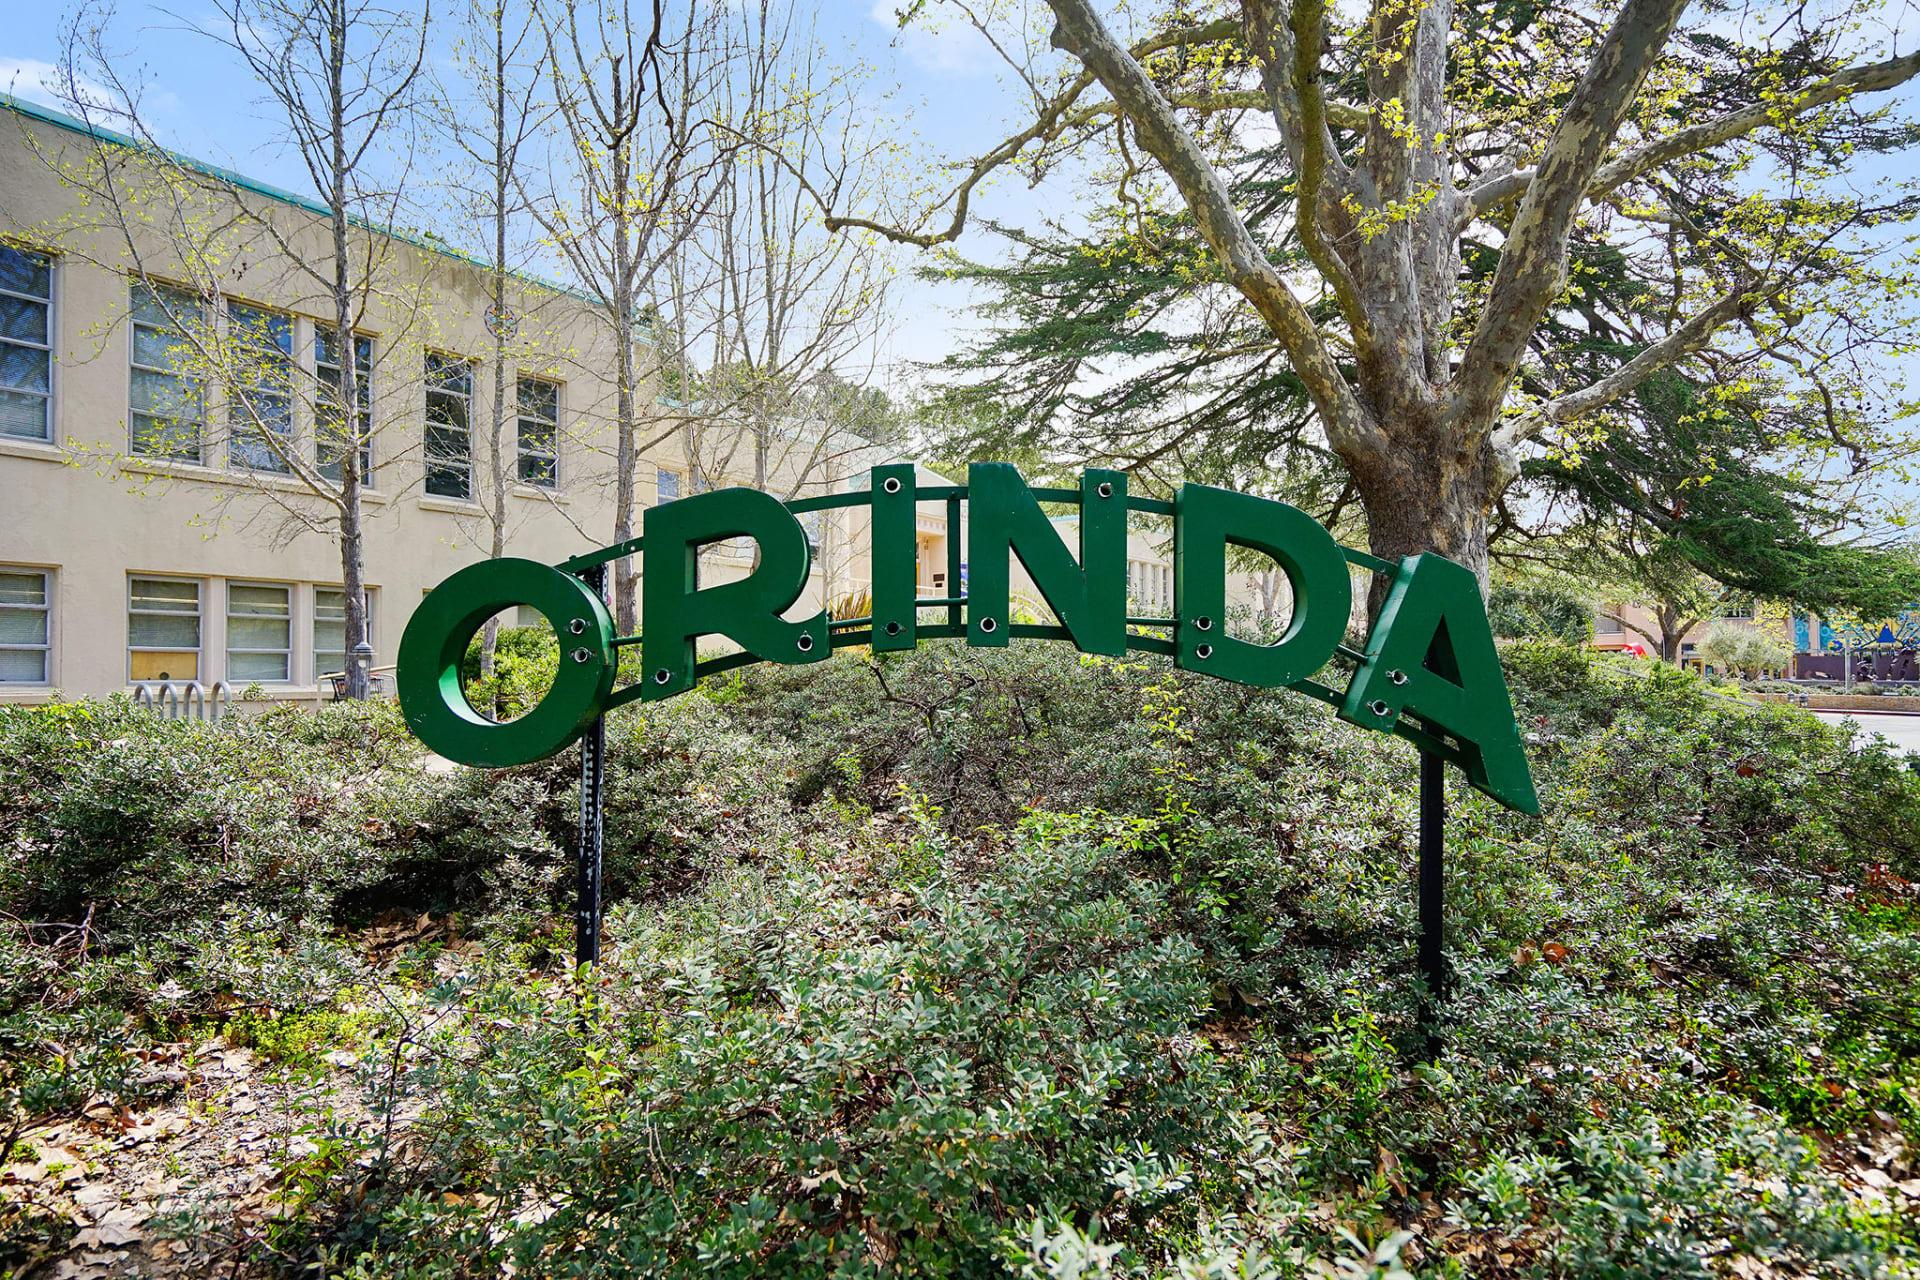 Orinda